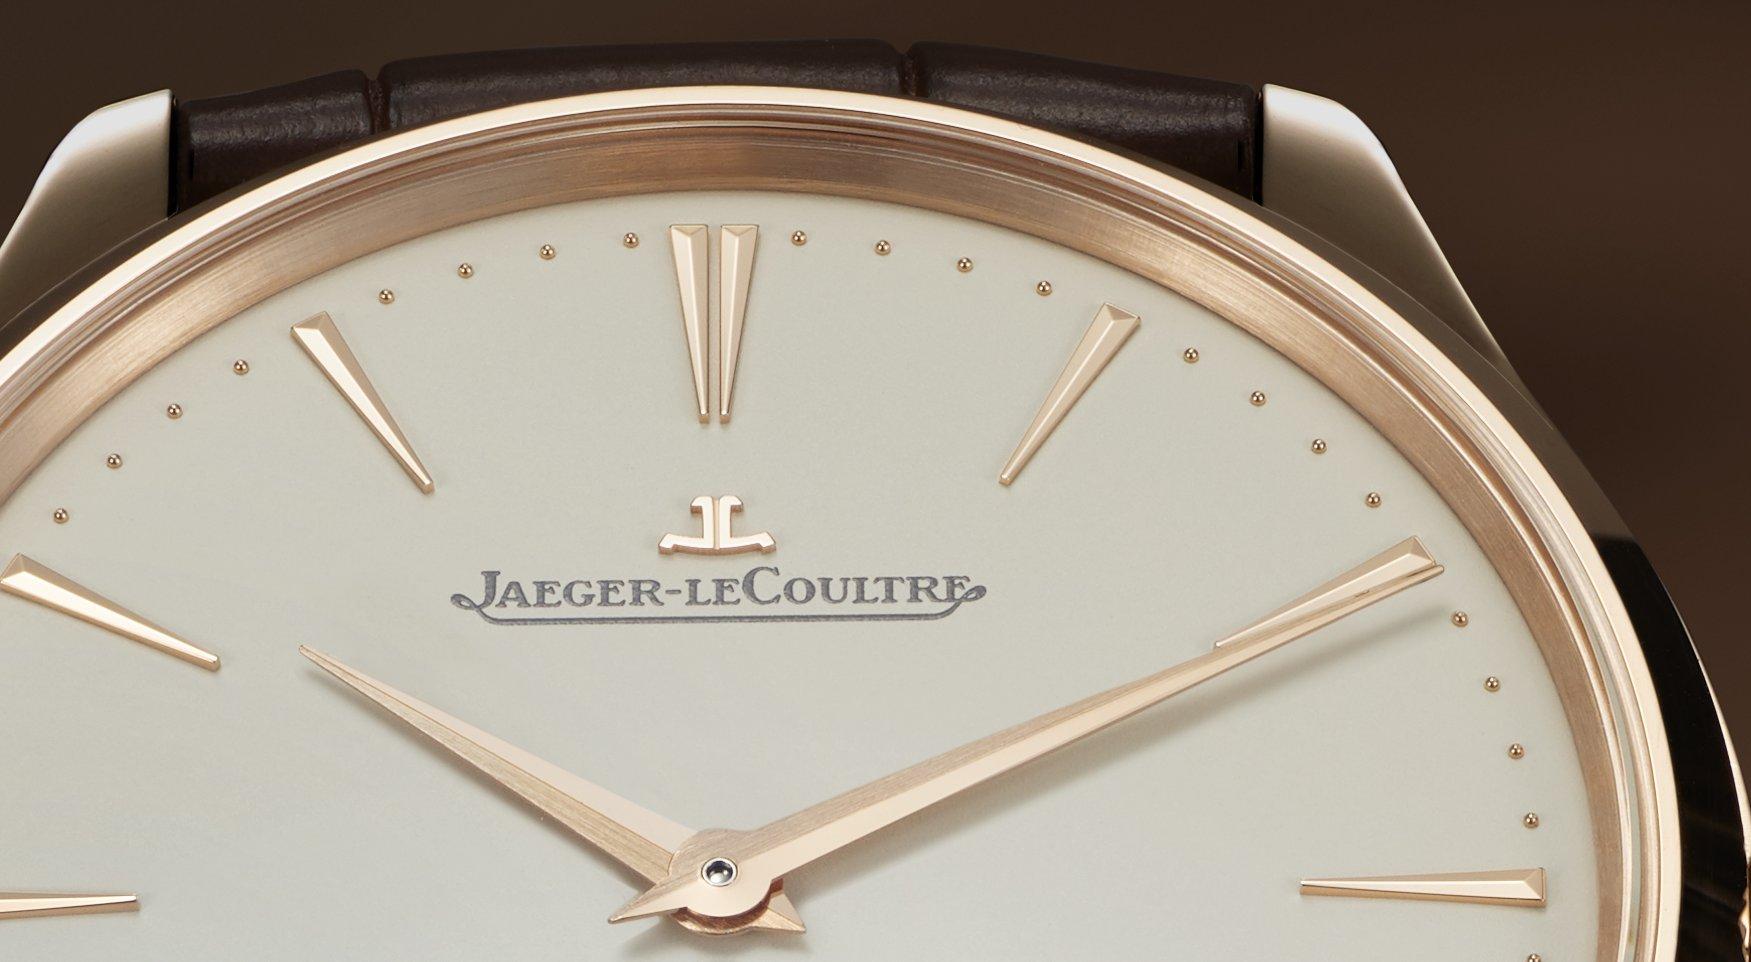 Jaeger-LeCoultre Master Ultra Thin Tourbillon